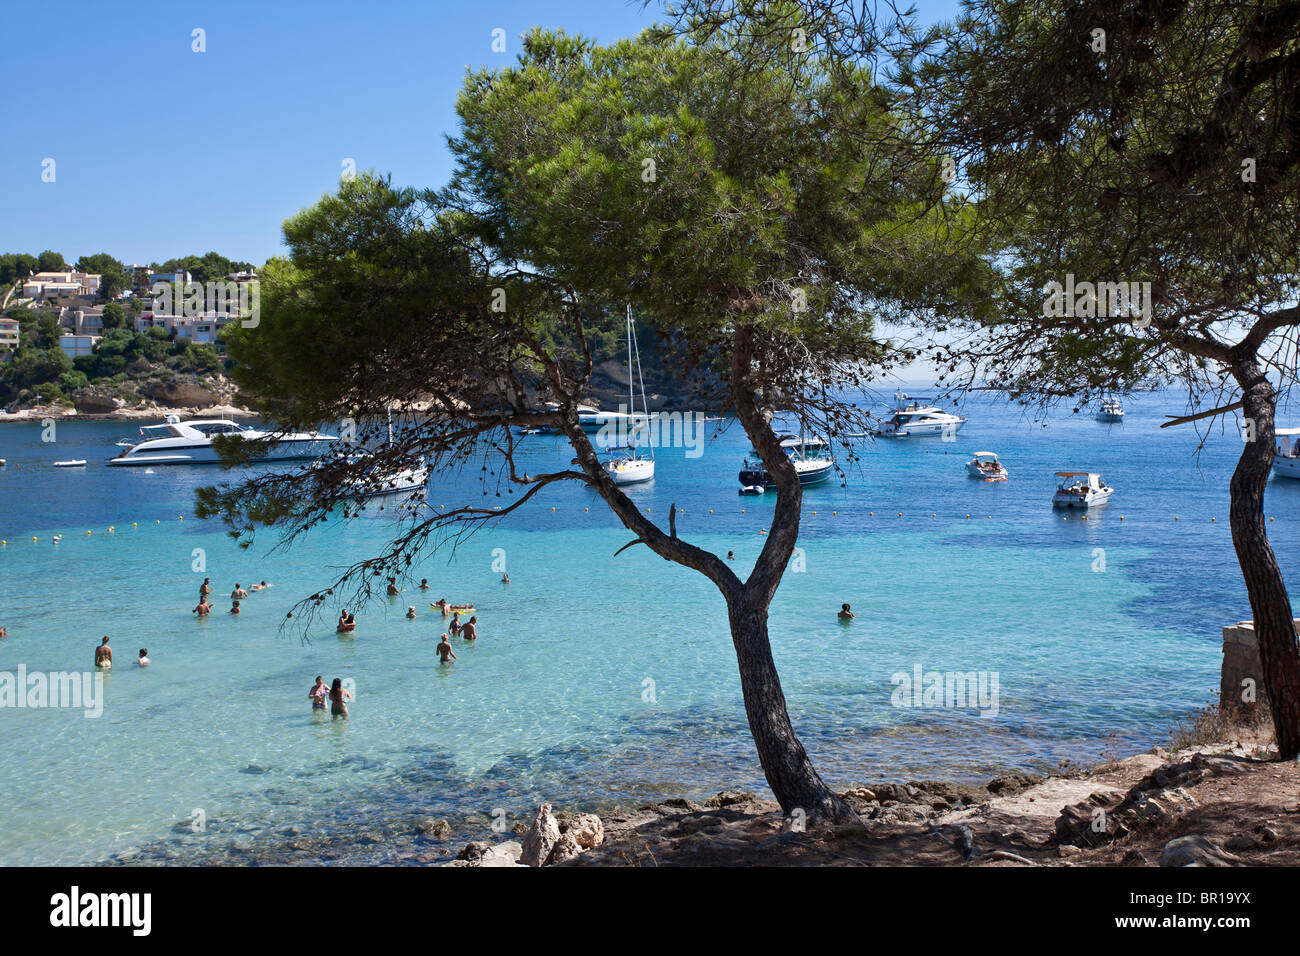 Portals Vells beach. Mallorca Island. Spain - Stock Image